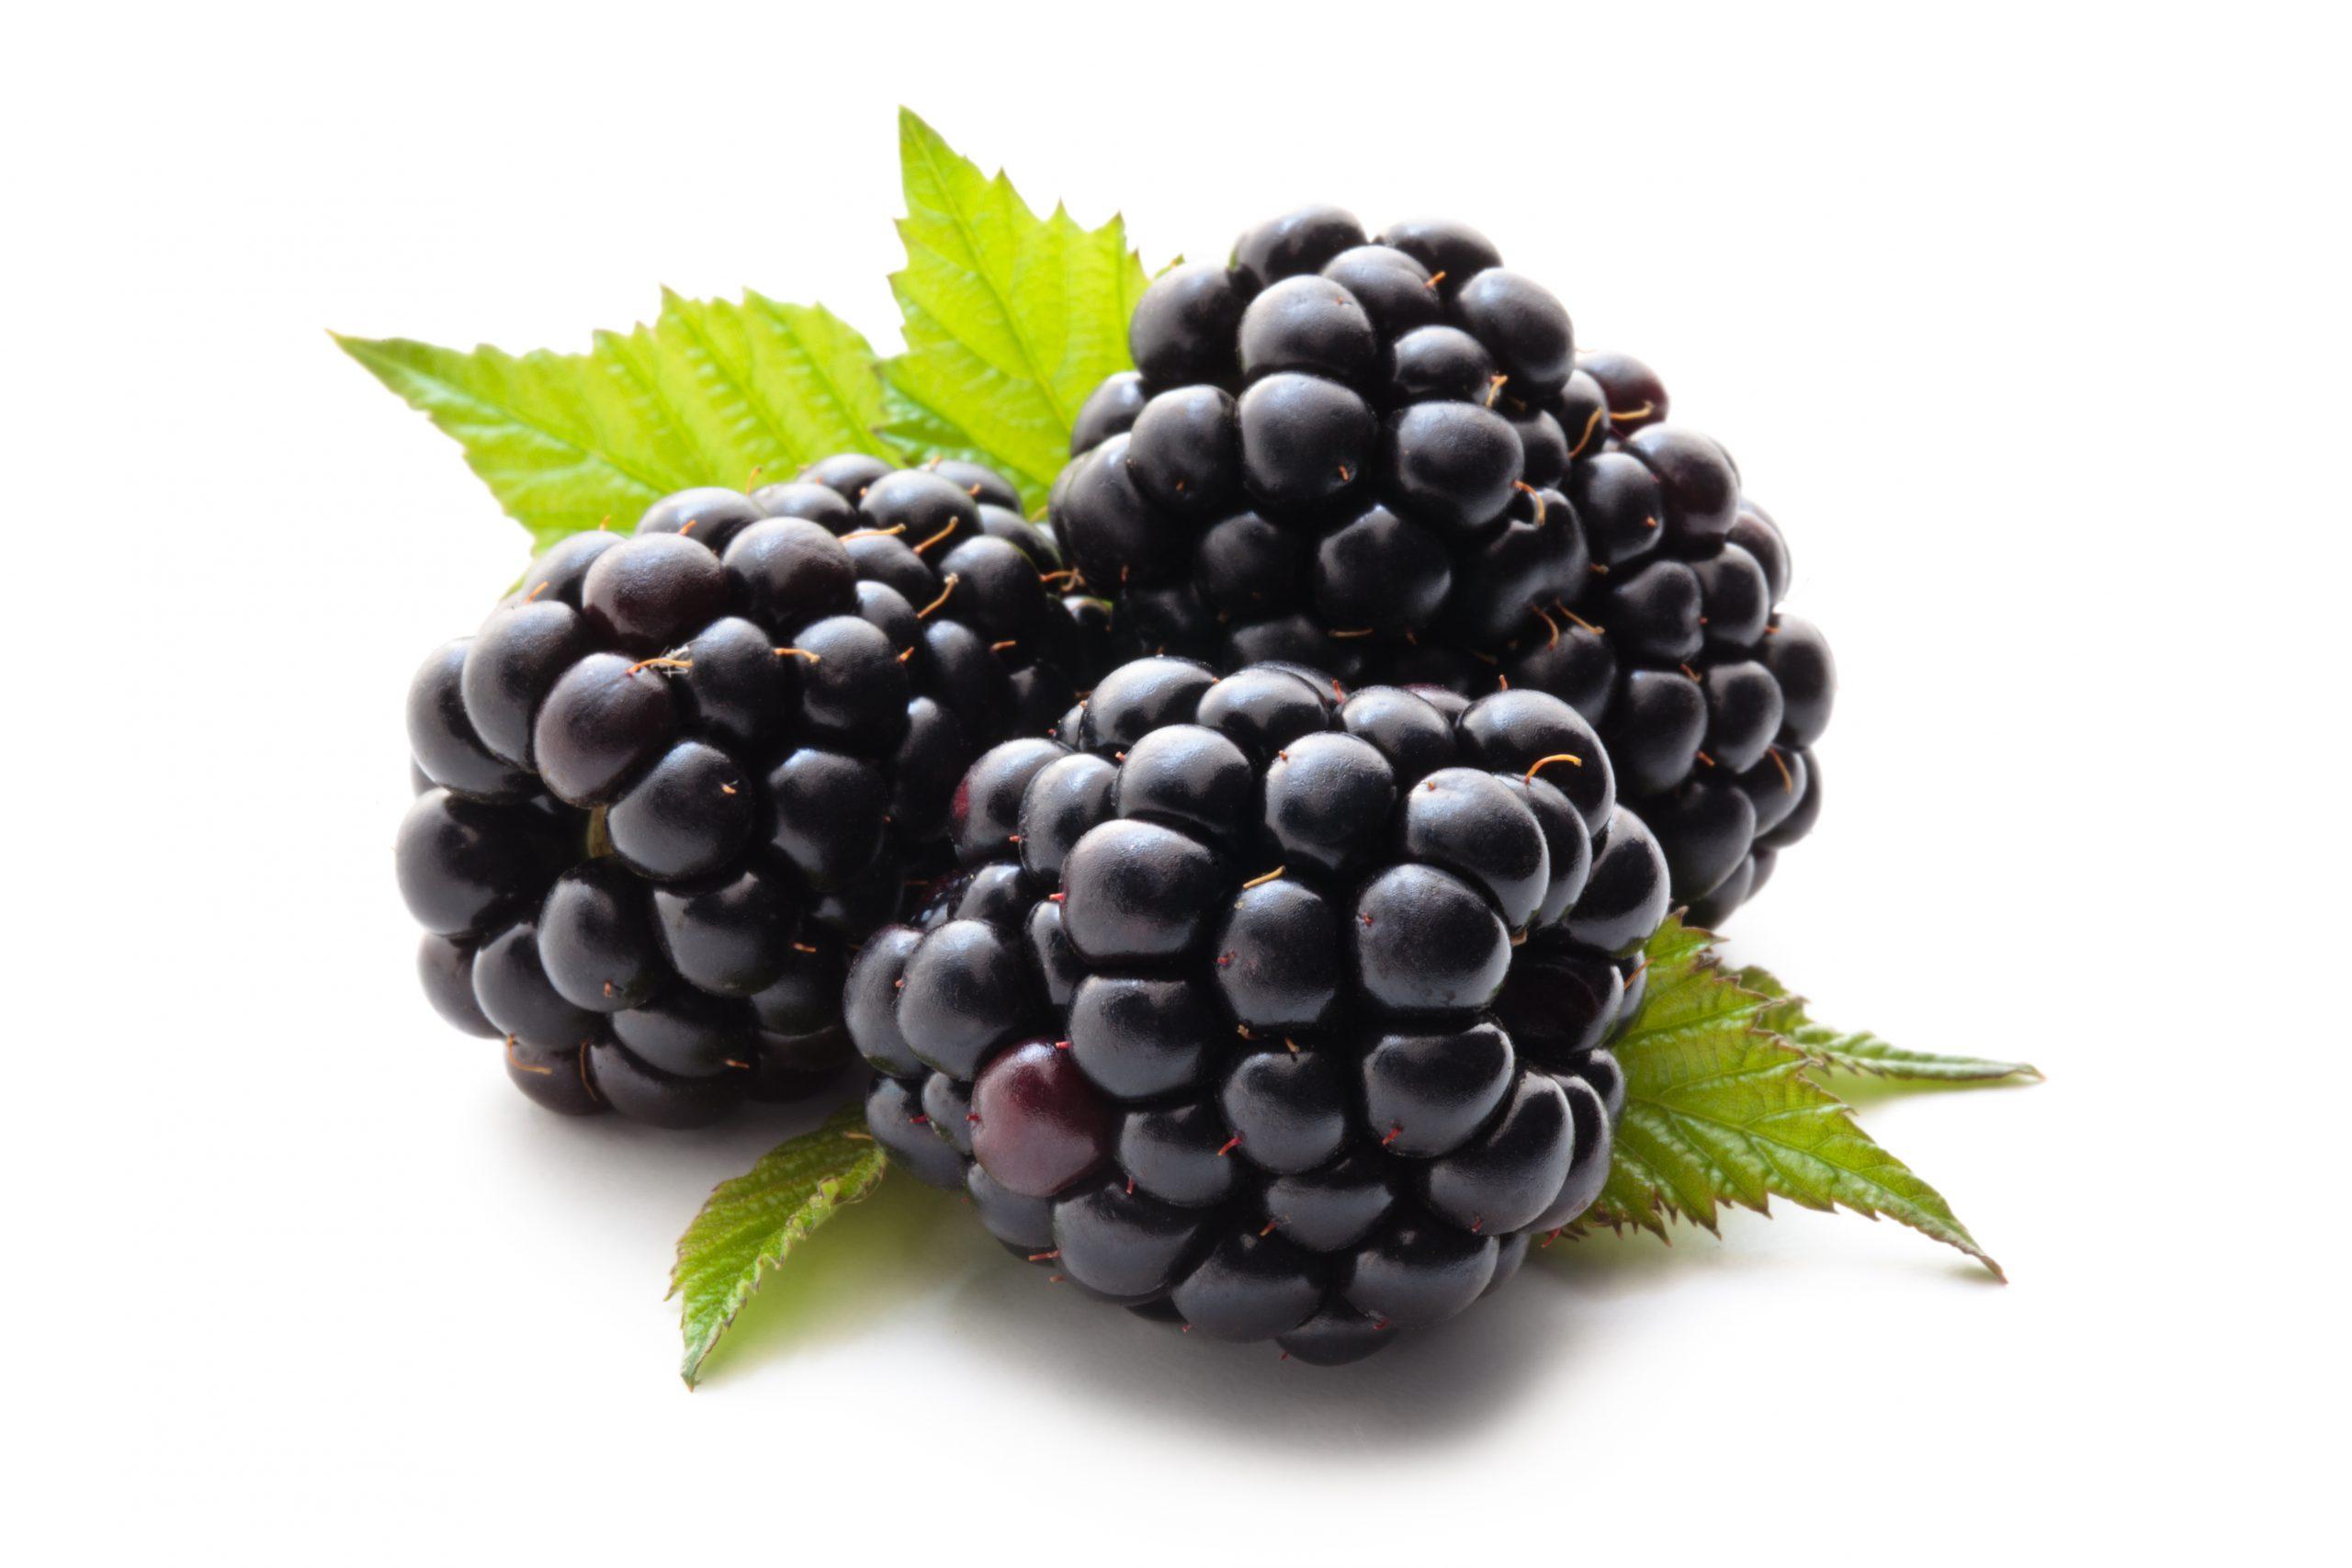 Blackberry (แบล็คเบอร์รี่)